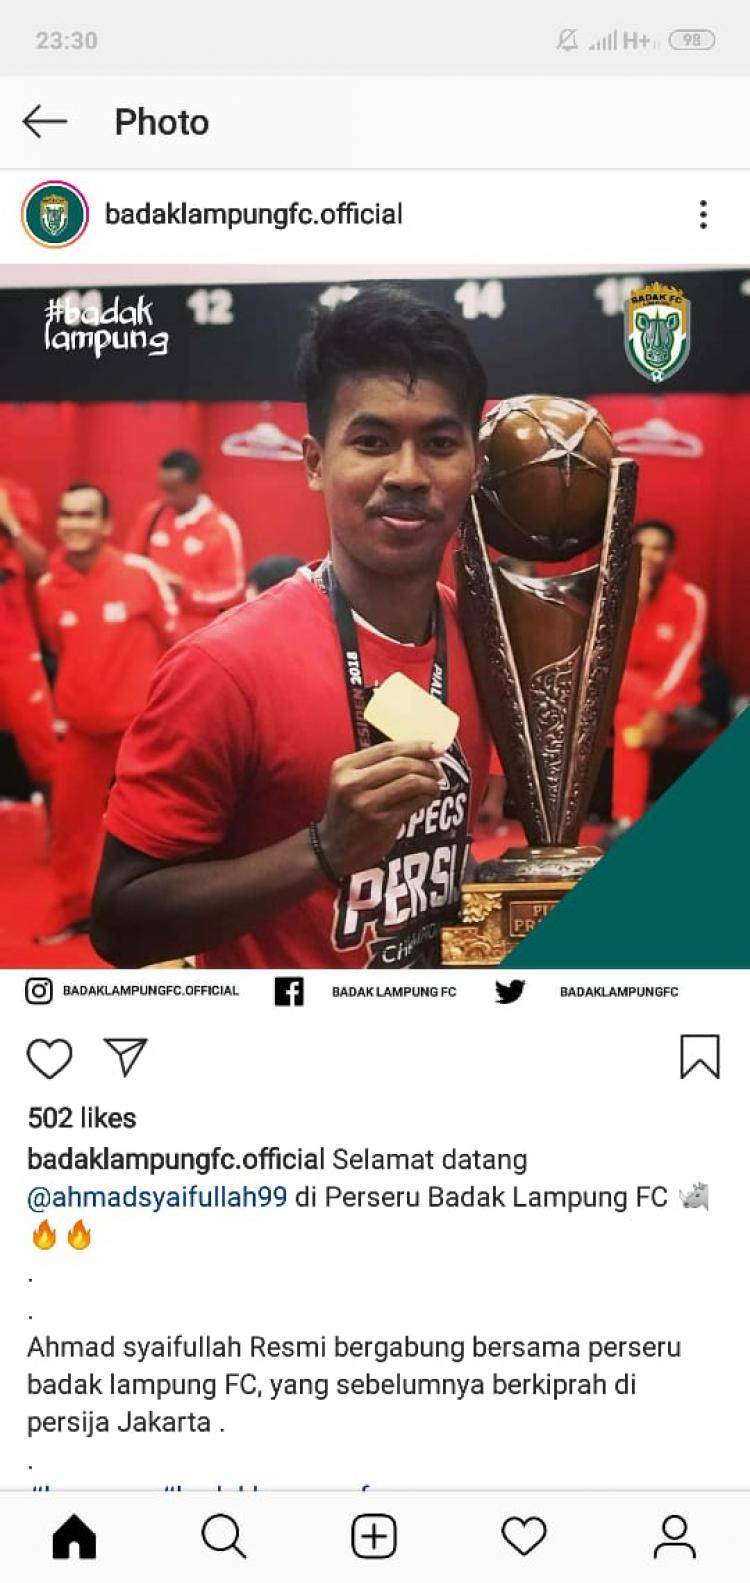 Perseru Badak Lampung borong pemain bintang. Copyright: instagram badaklampungfc.official